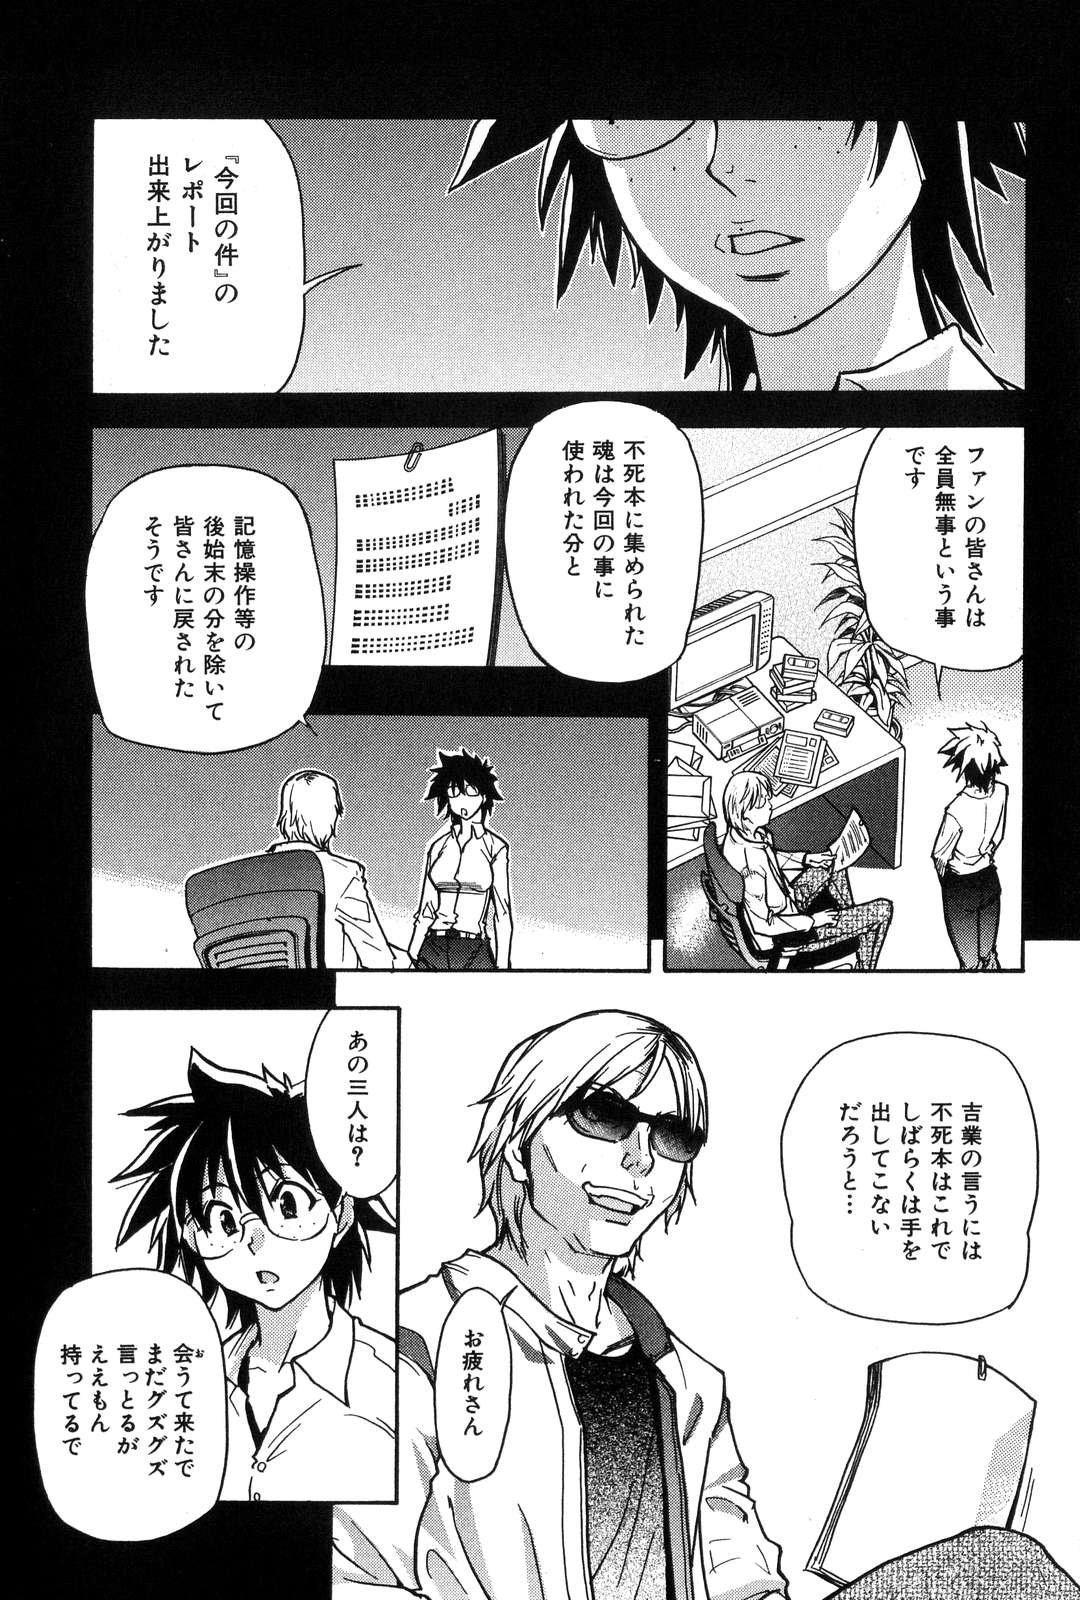 Shining Musume. 6. Rainbow Six 217